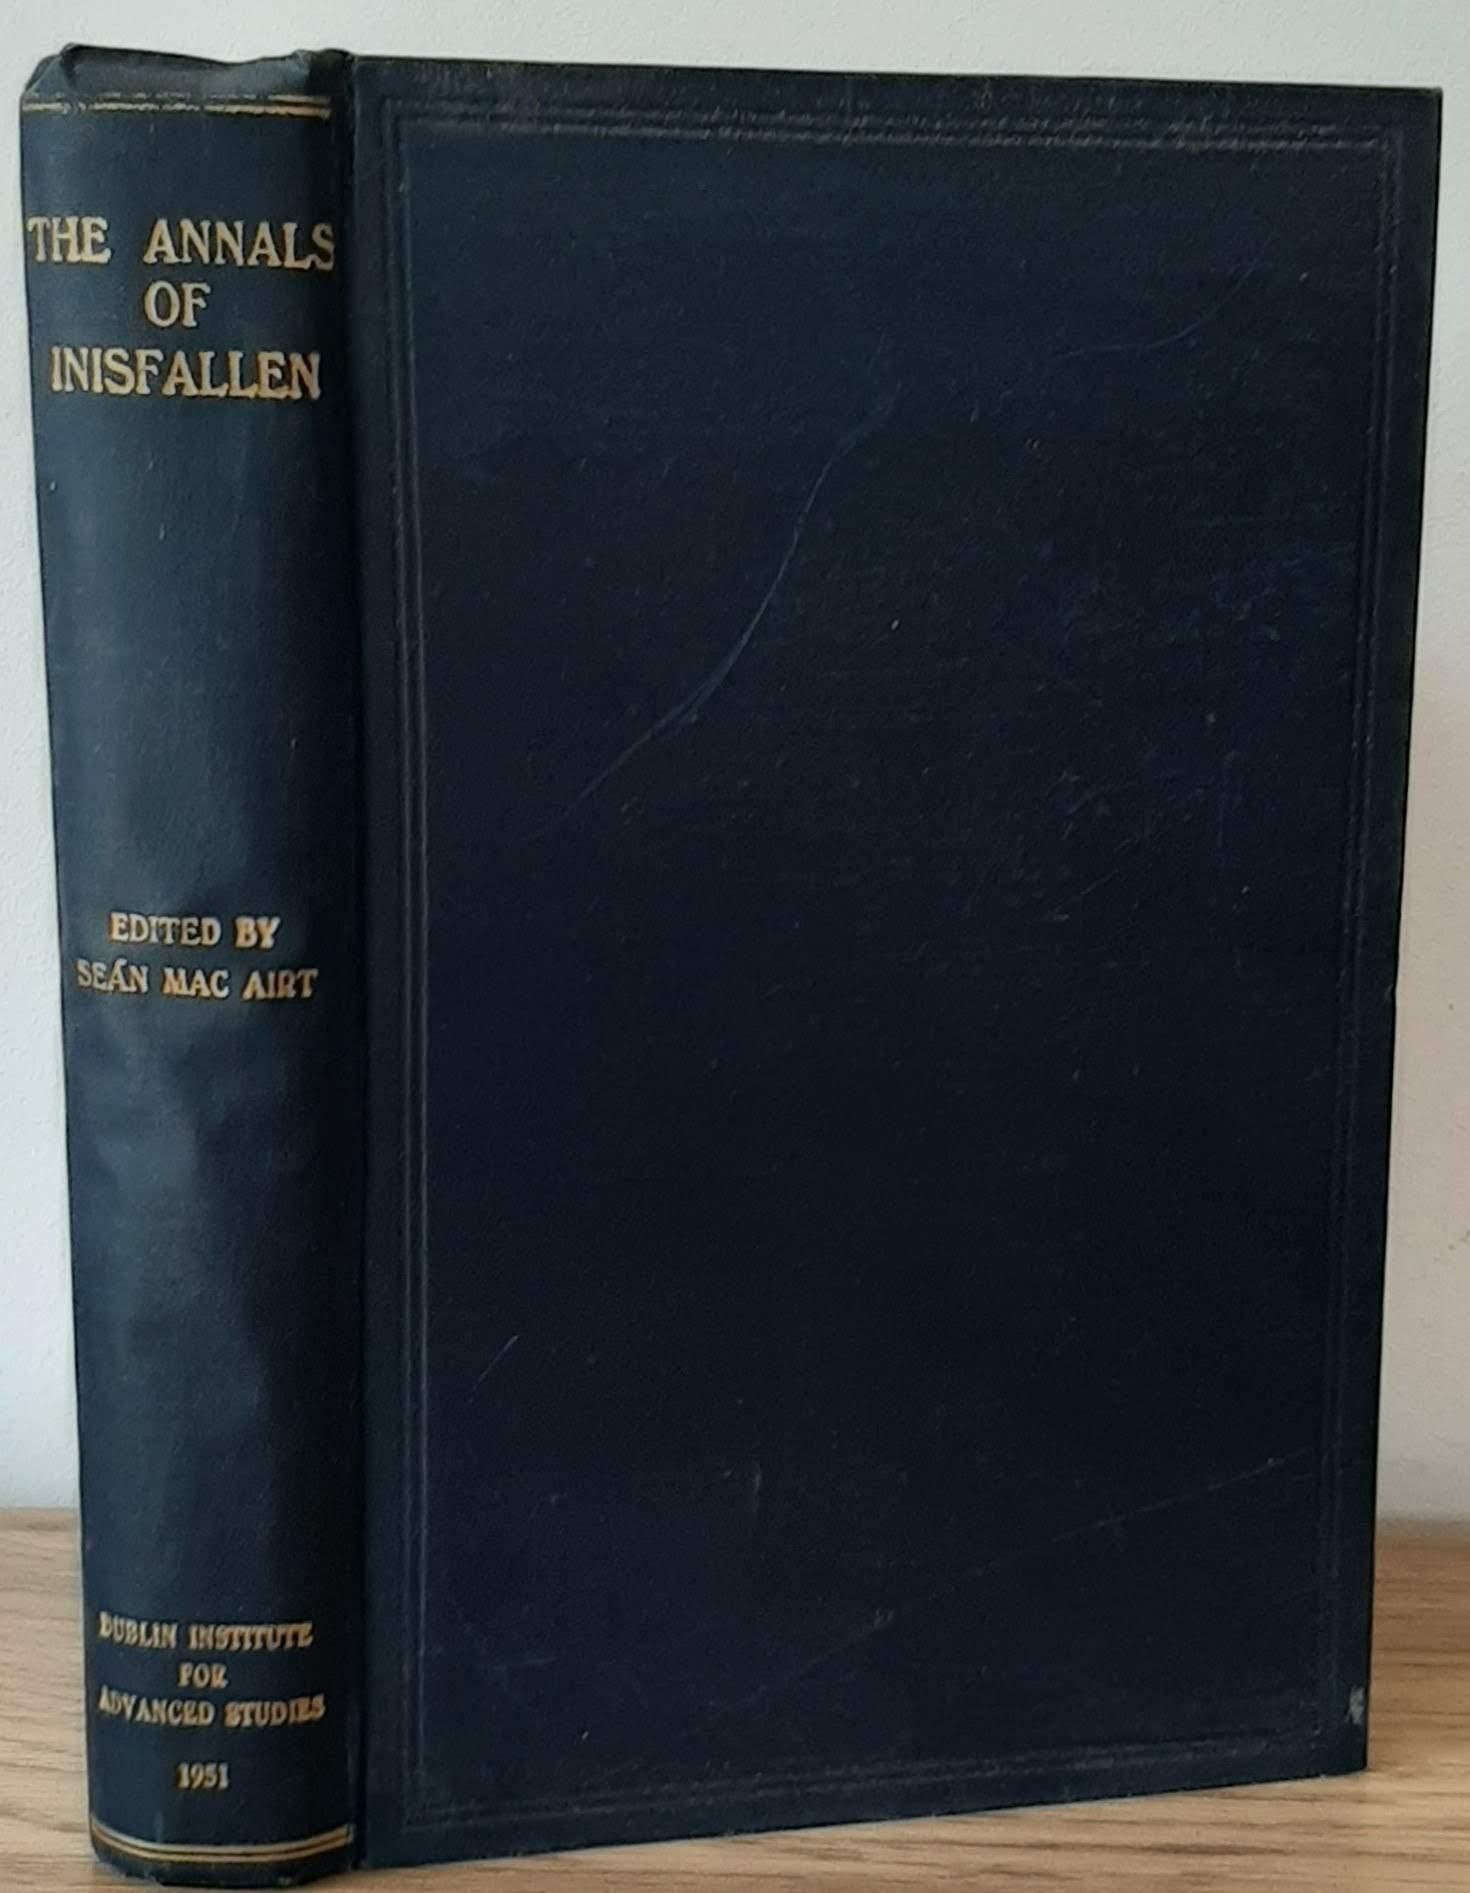 The Annals of Inisfallen (Mac Airt, 1951, 1st).